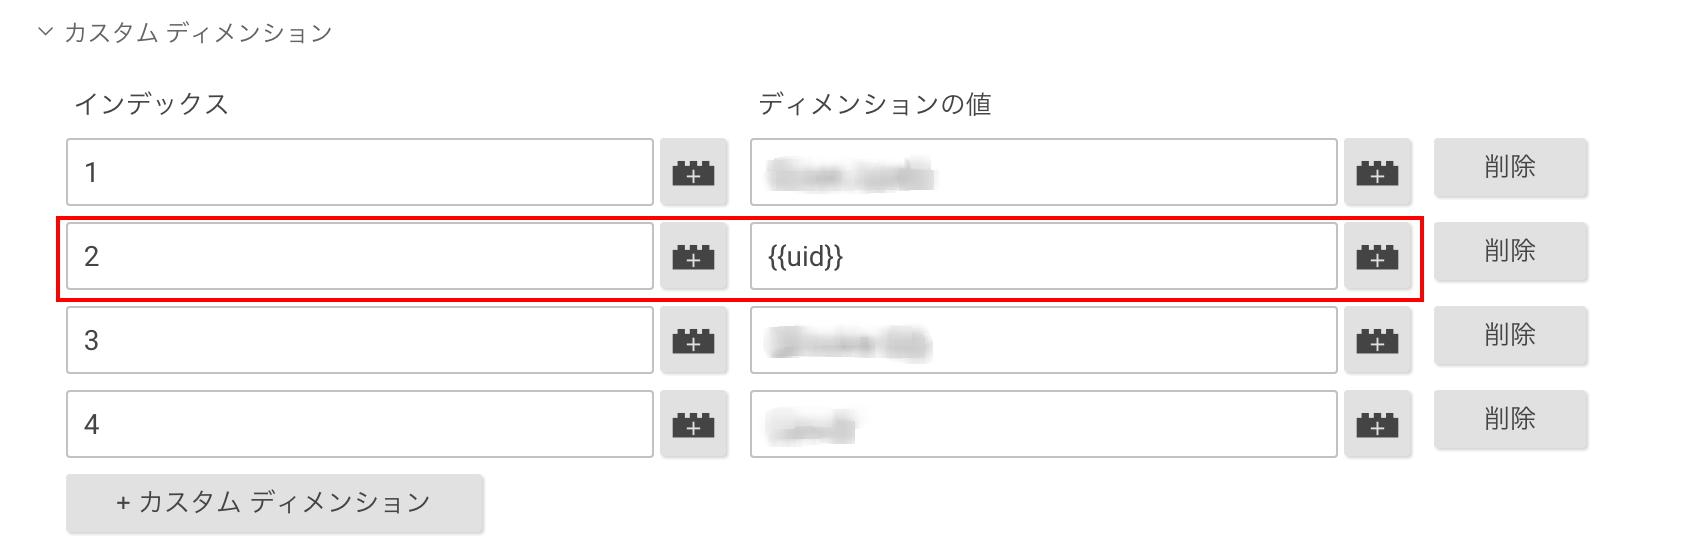 Google Tag Manager_cdi.png